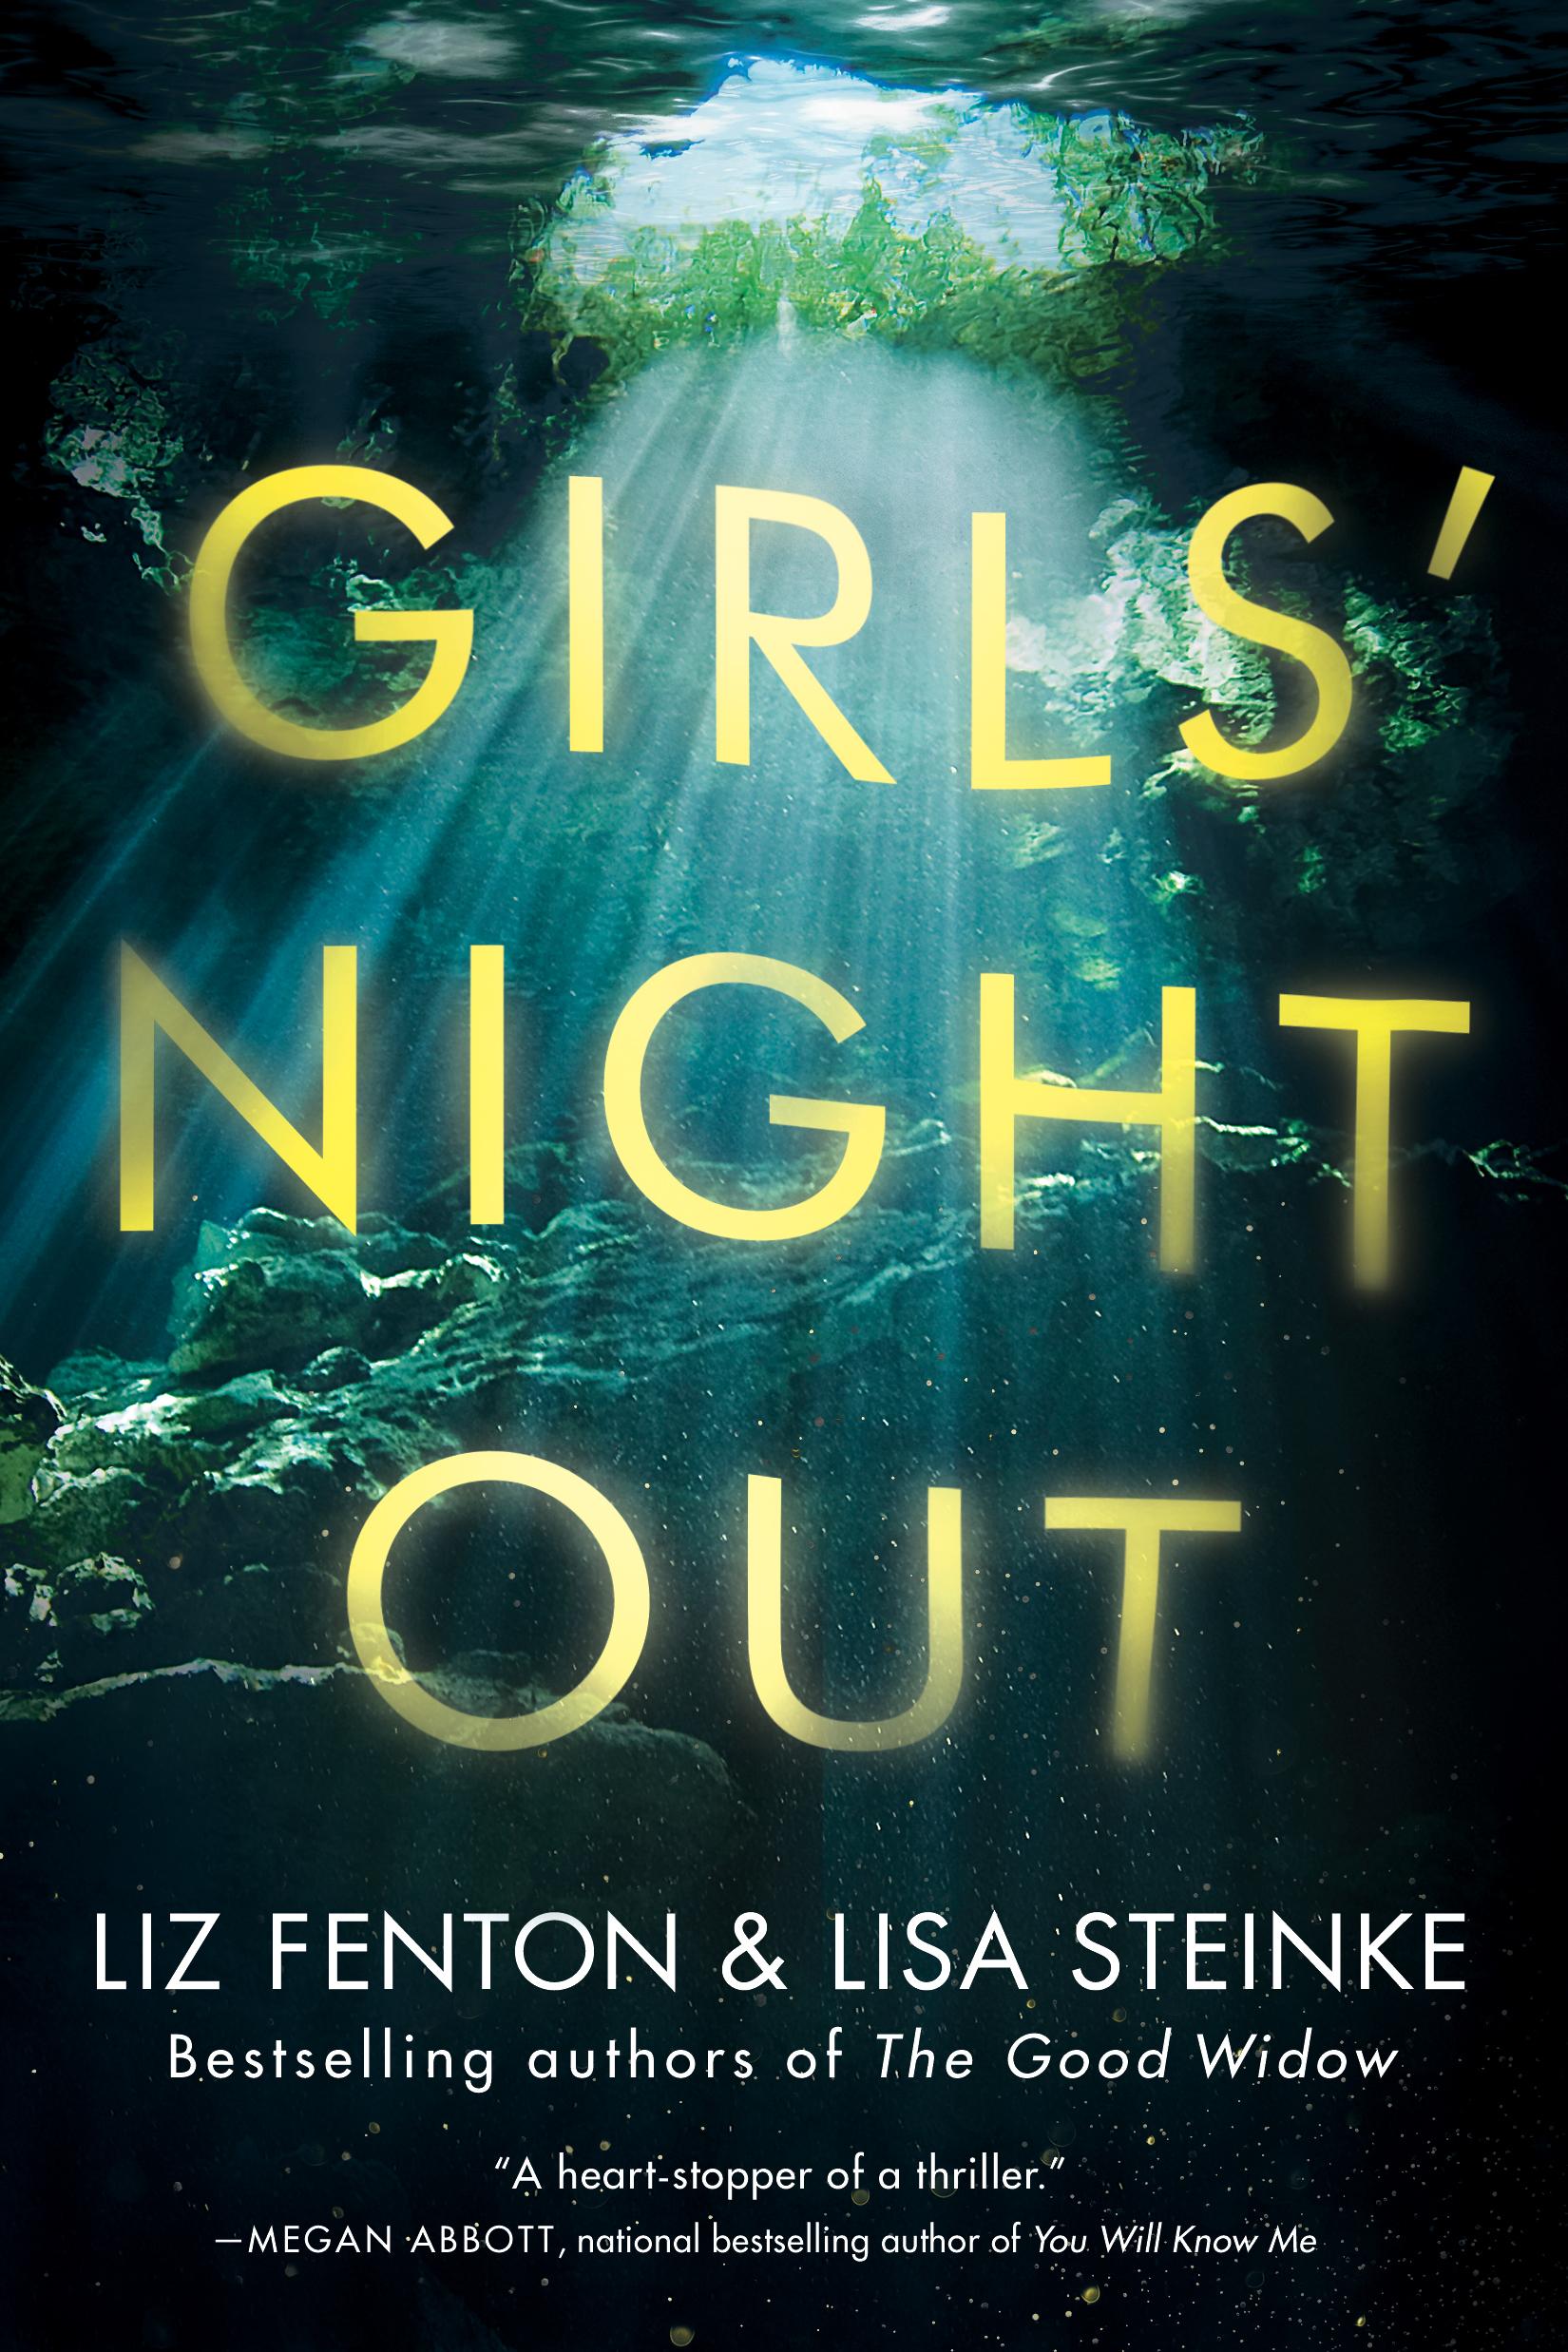 Girls'+Night+Out_300dpi+copy.jpg